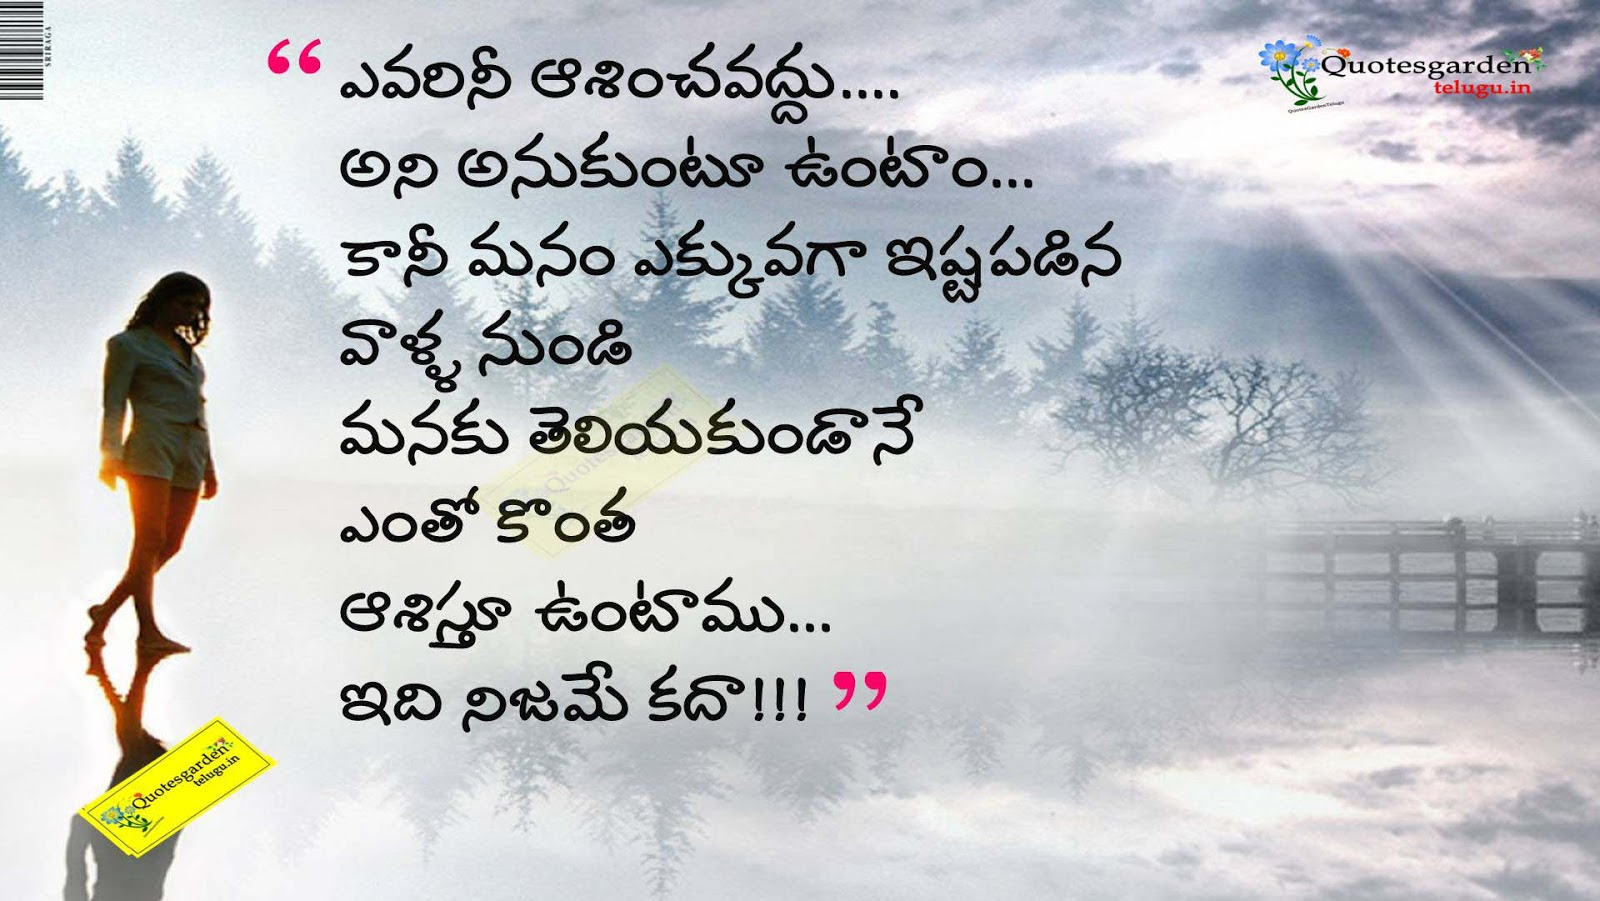 Telugu Heart Breaking Love Quotes 18 Adult Webcam Jobs